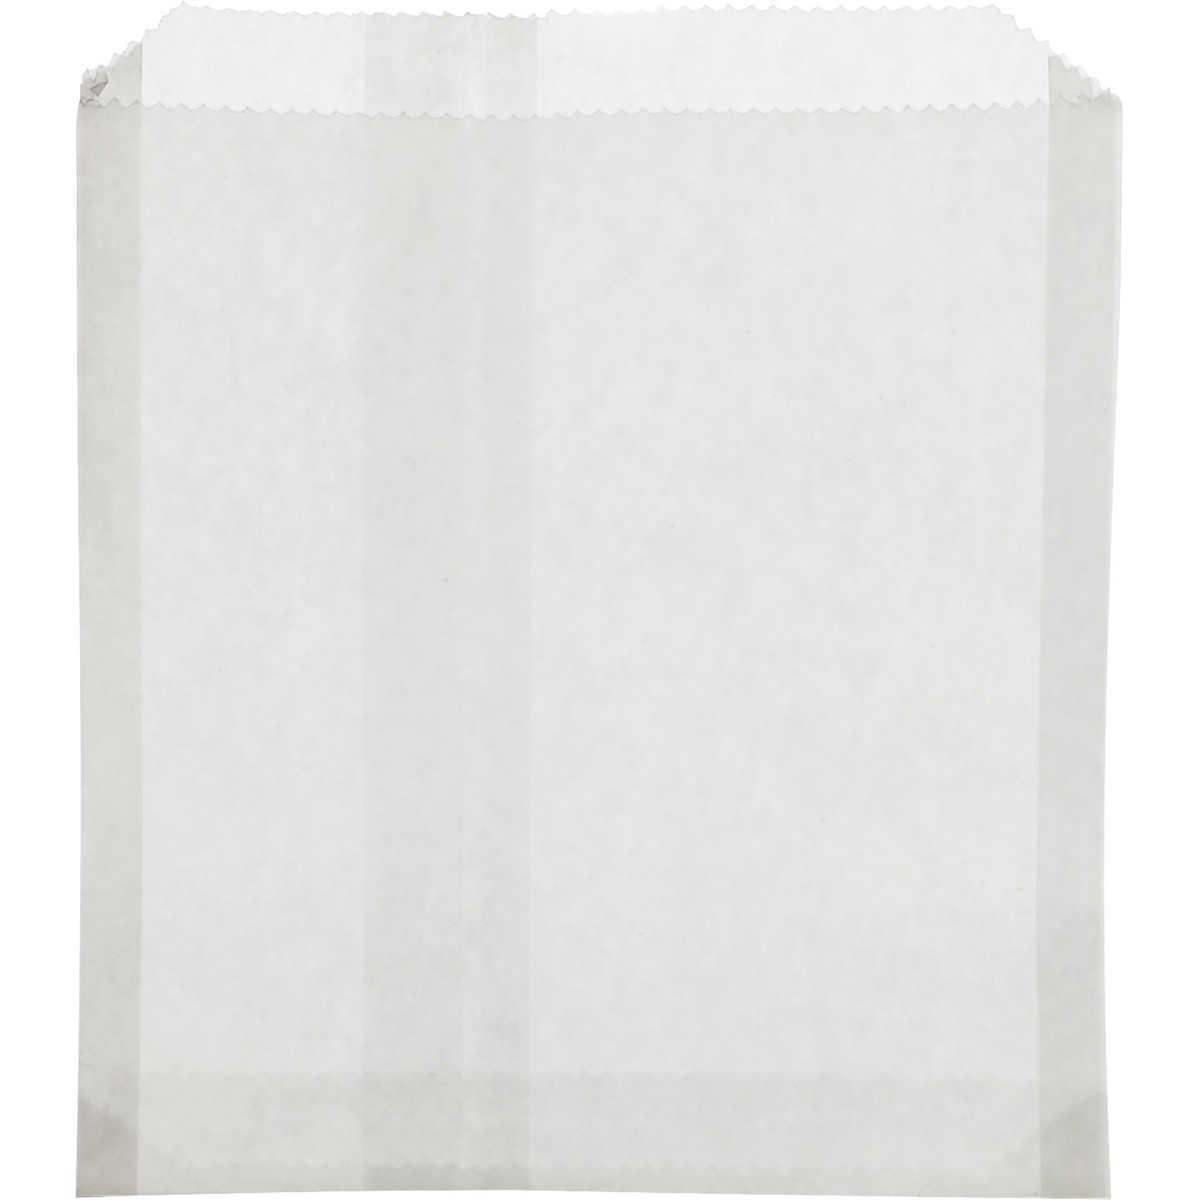 Black t shirt carryout bags 1000 ct - Bagcraft Sandwich Bag White 1000 Ct